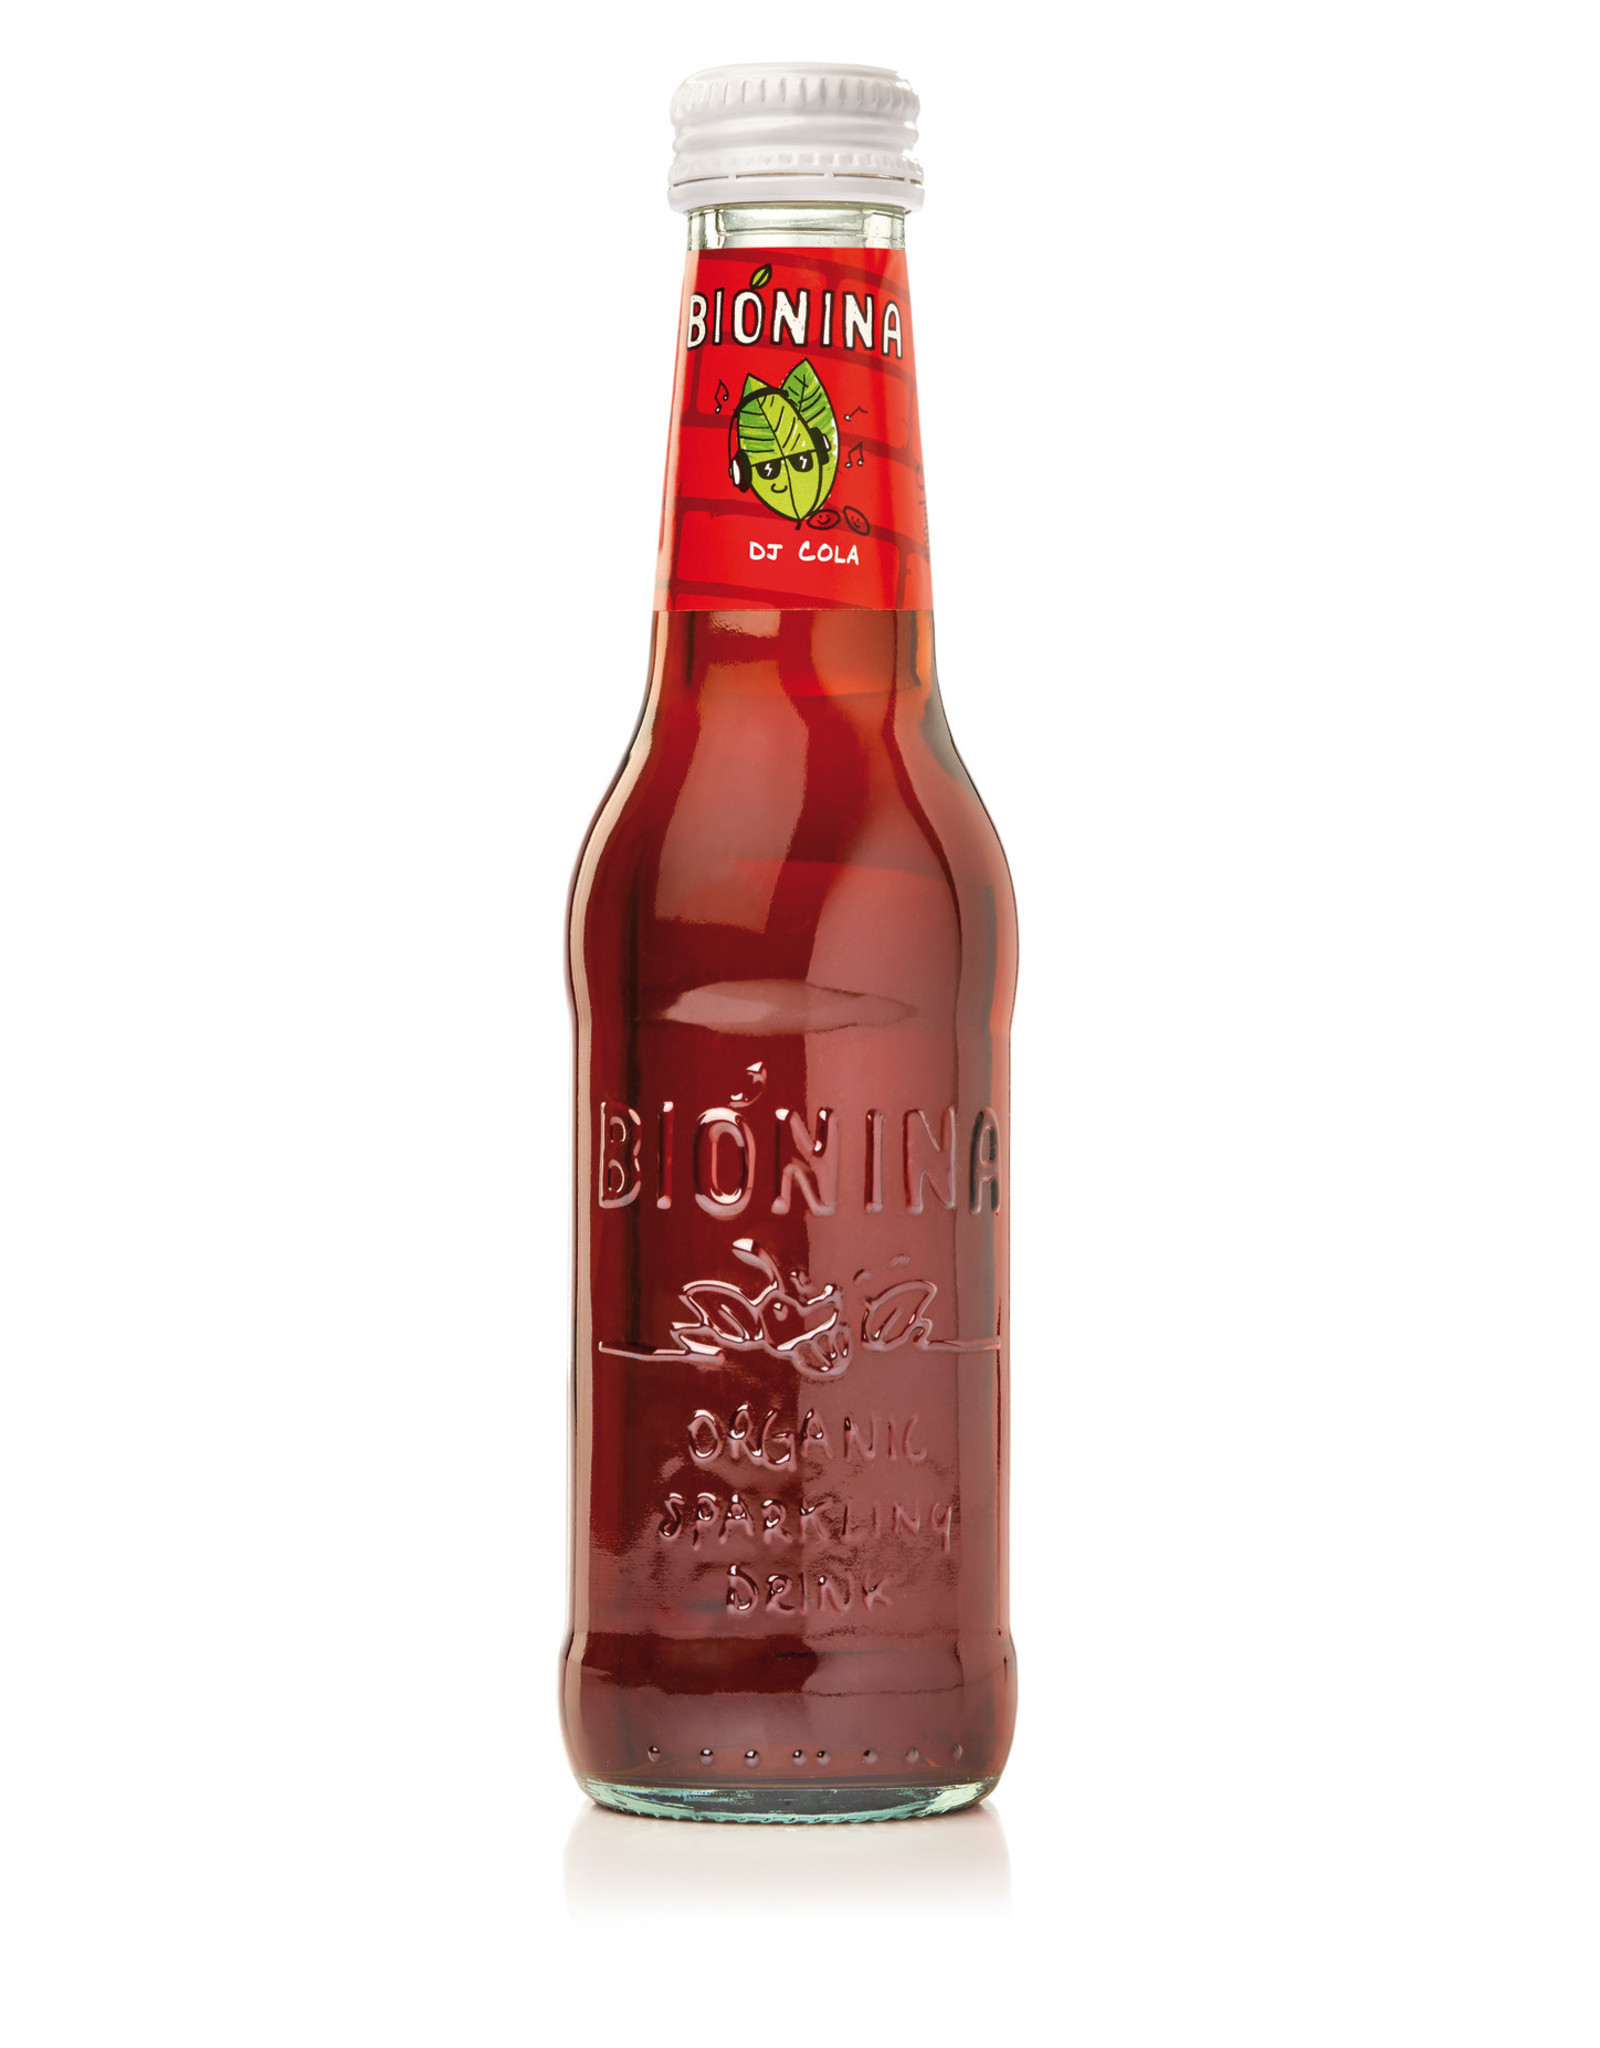 Bionina Bionina flesje DJ Cola 200ml